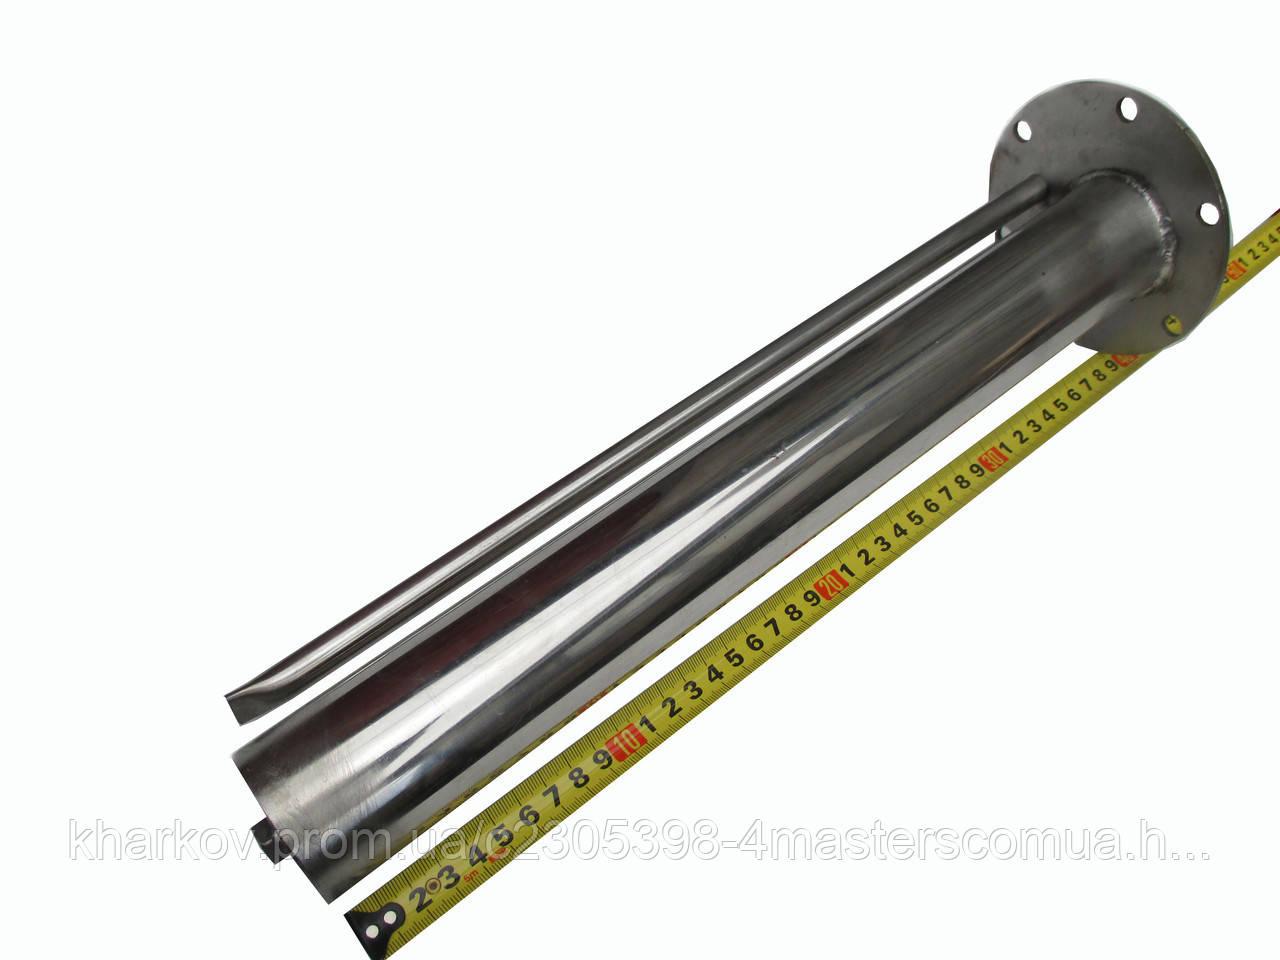 Фланец колба для бойлера Atlantic 2100/2400 W